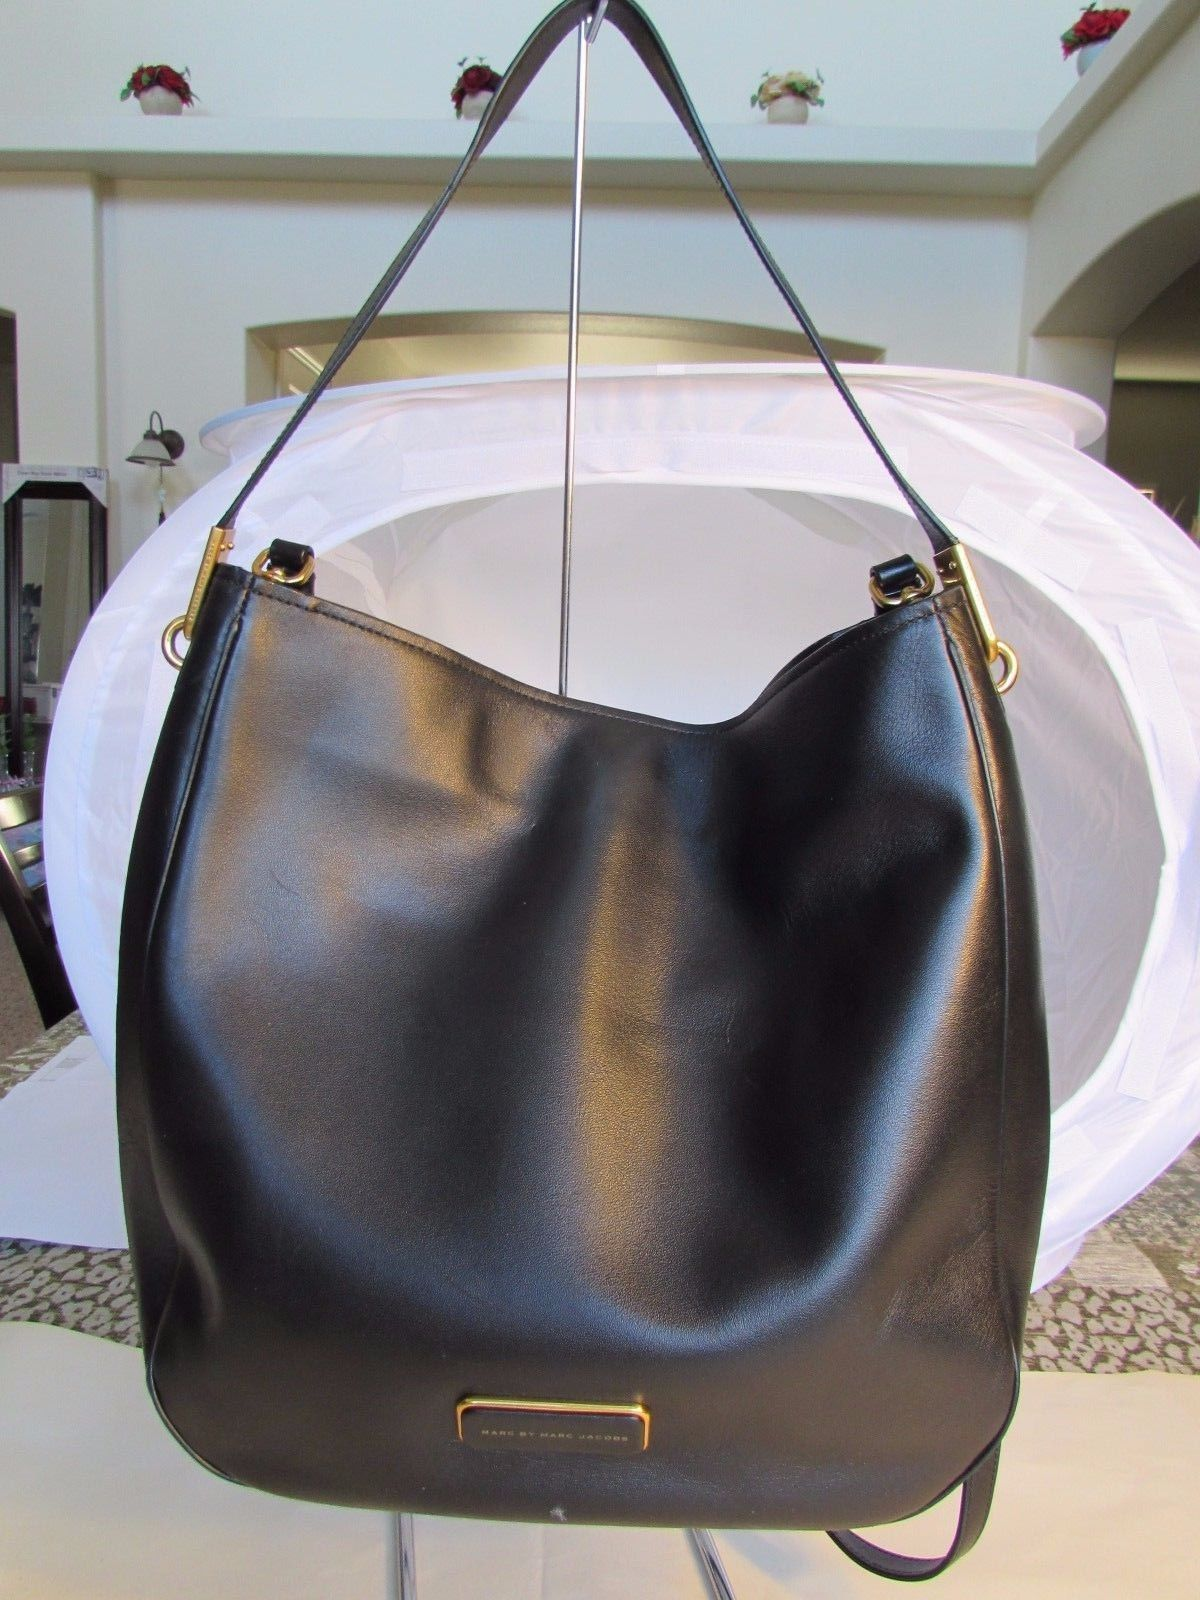 dda70157061e Marc by Marc Jacobs LIGERO Hobo Black Leather 2-WAY Handbag Crossbody  071969-06